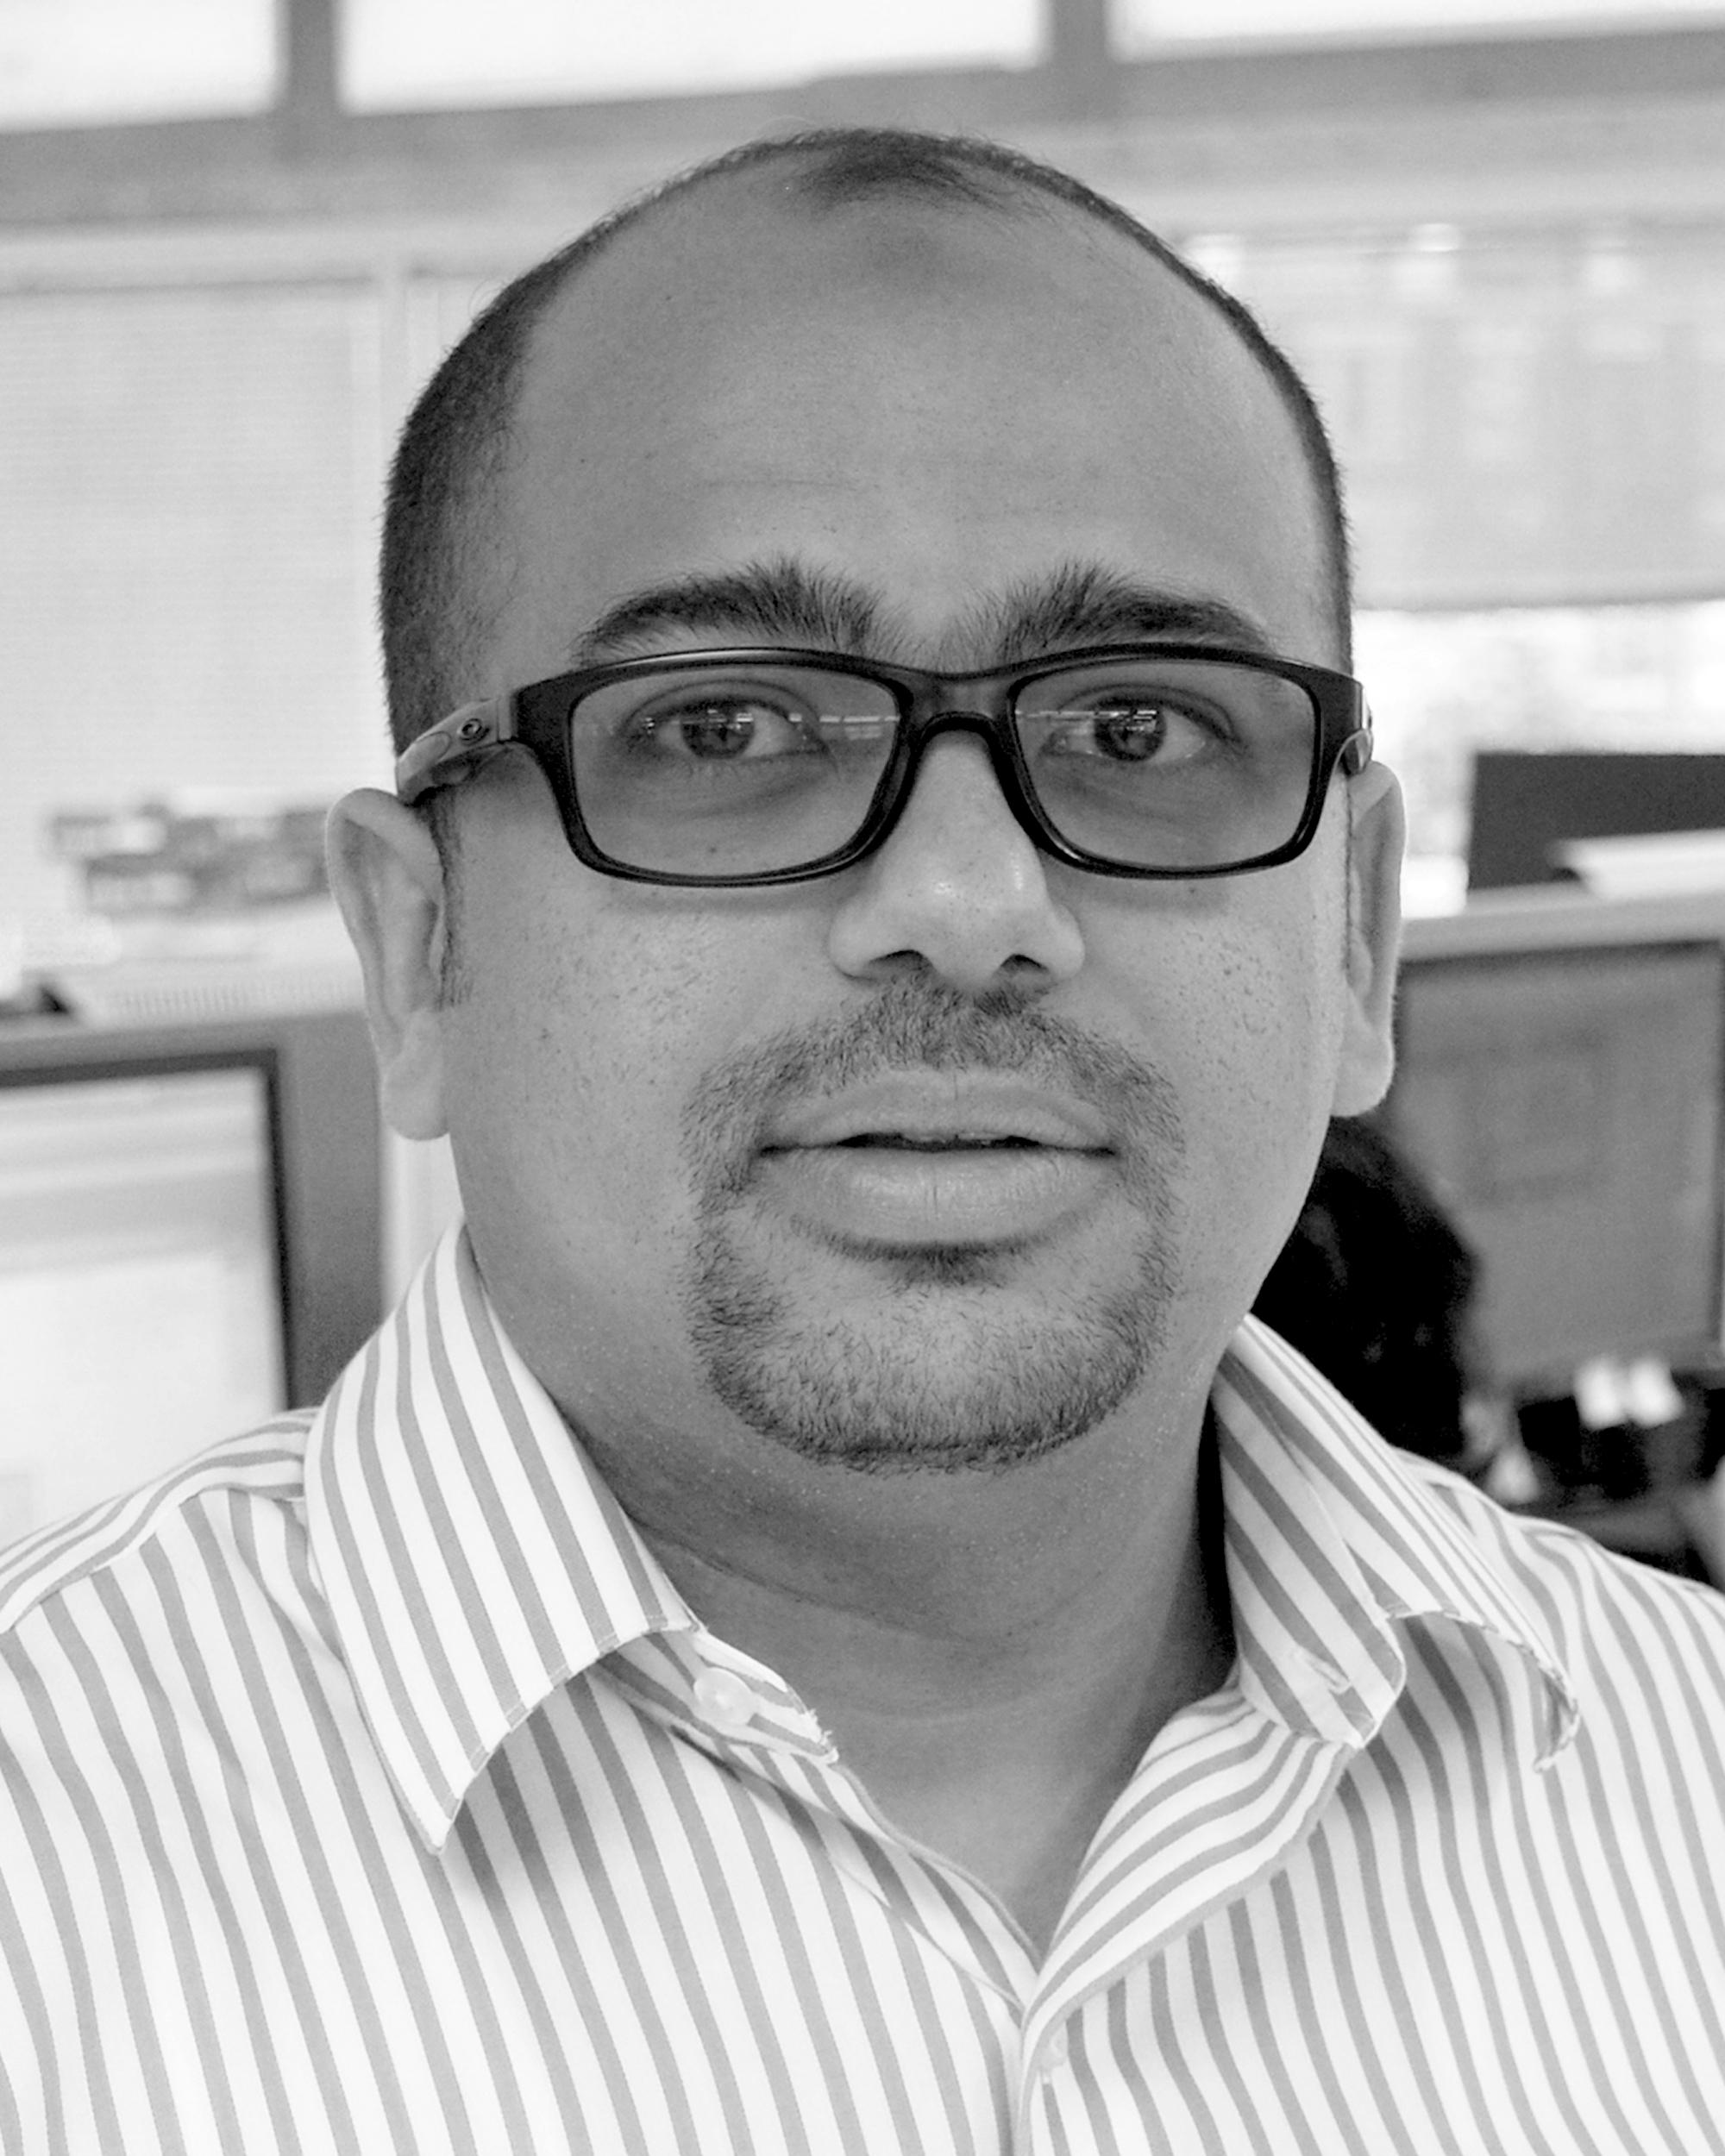 Headshot of Nabil Sallam